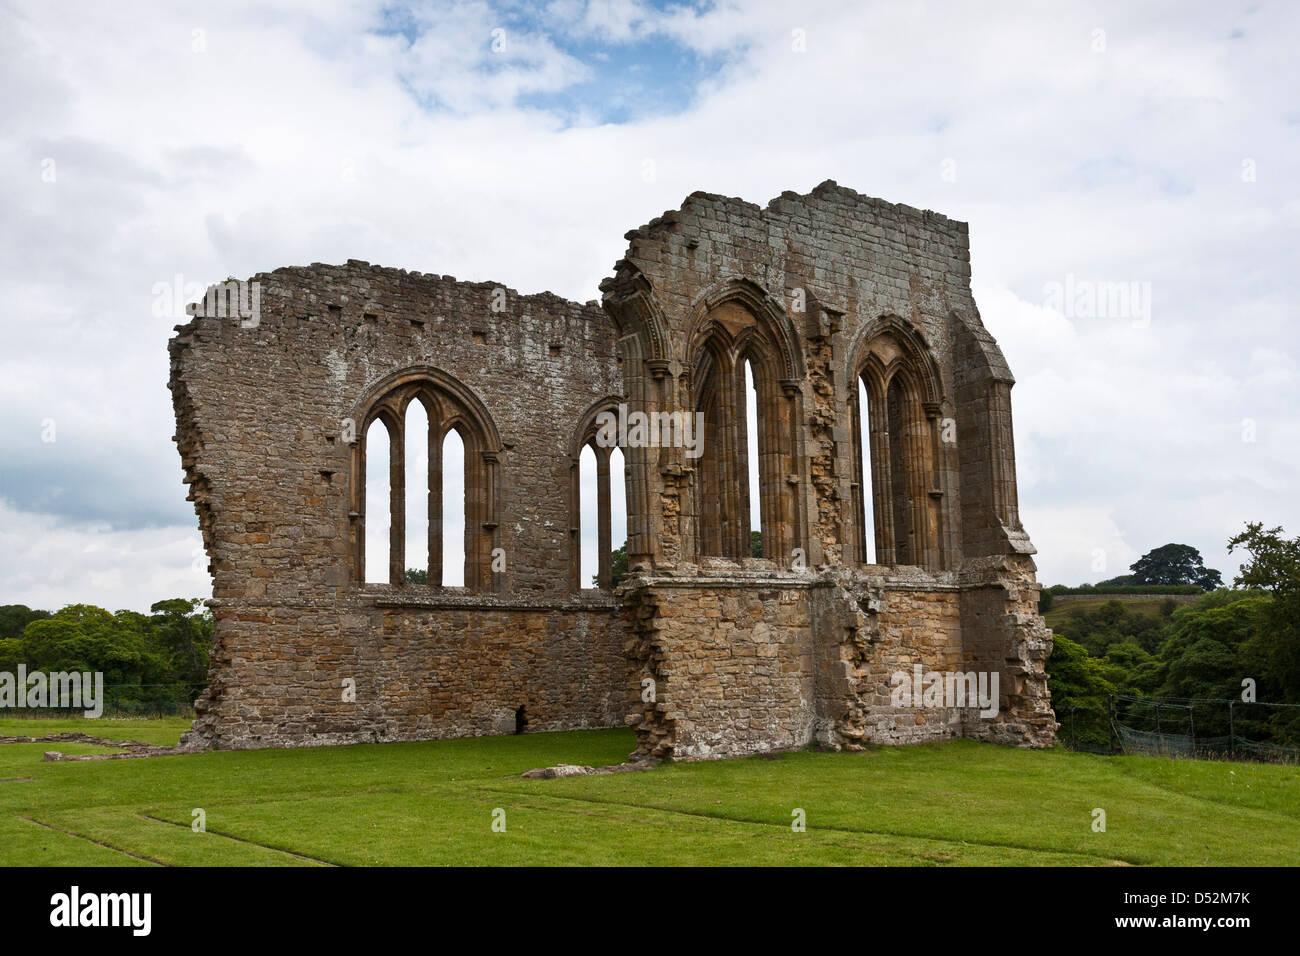 Egglestone Abbey North Yorkshire - Stock Image